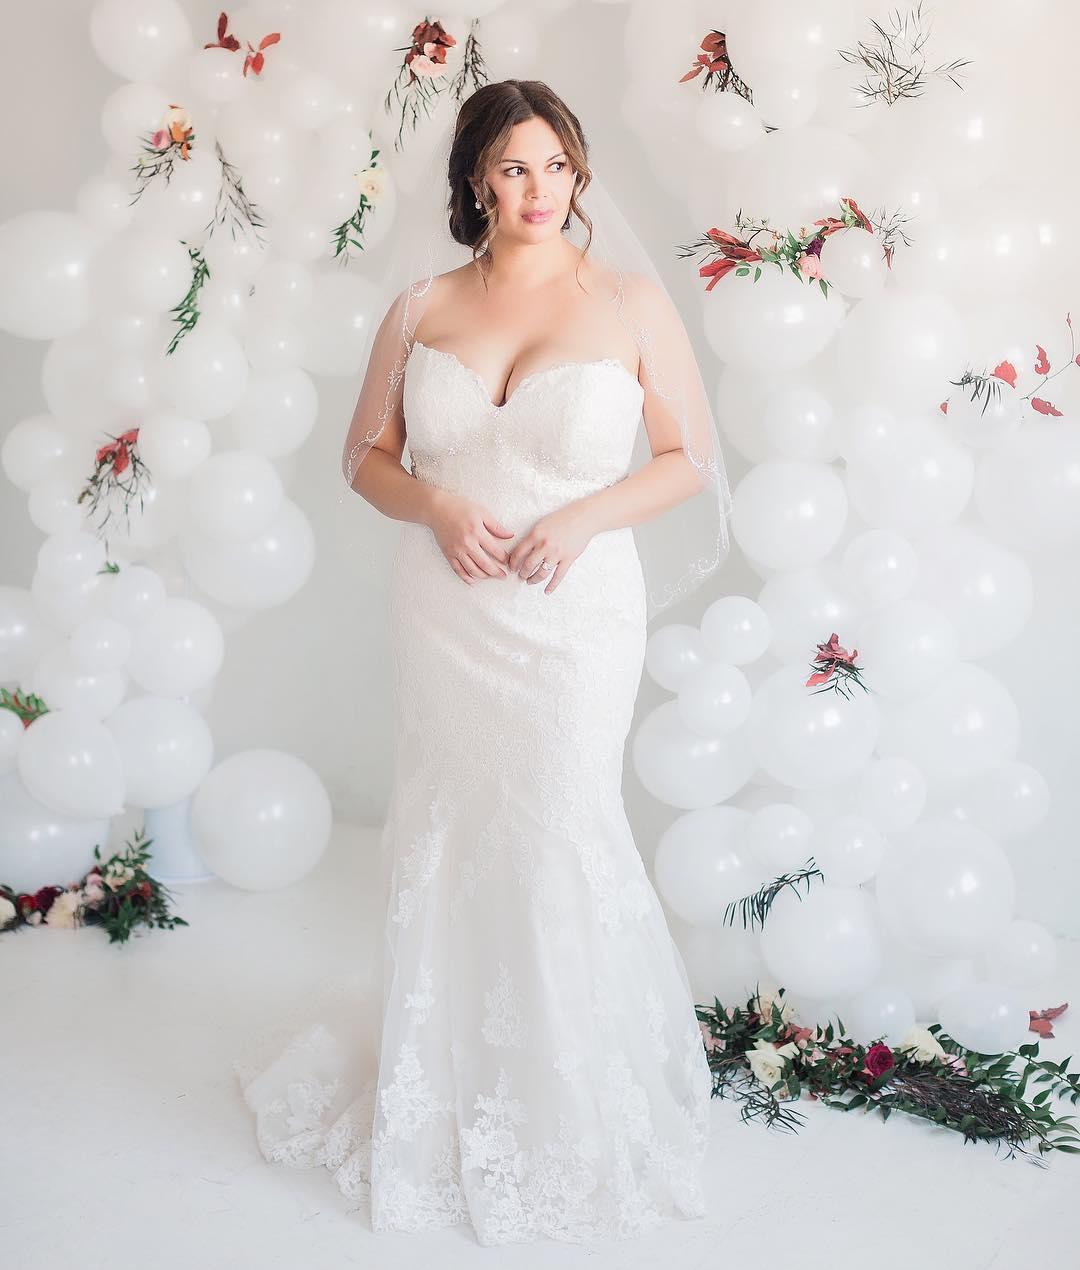 Ultimate Flower Embedded Wedding Dress